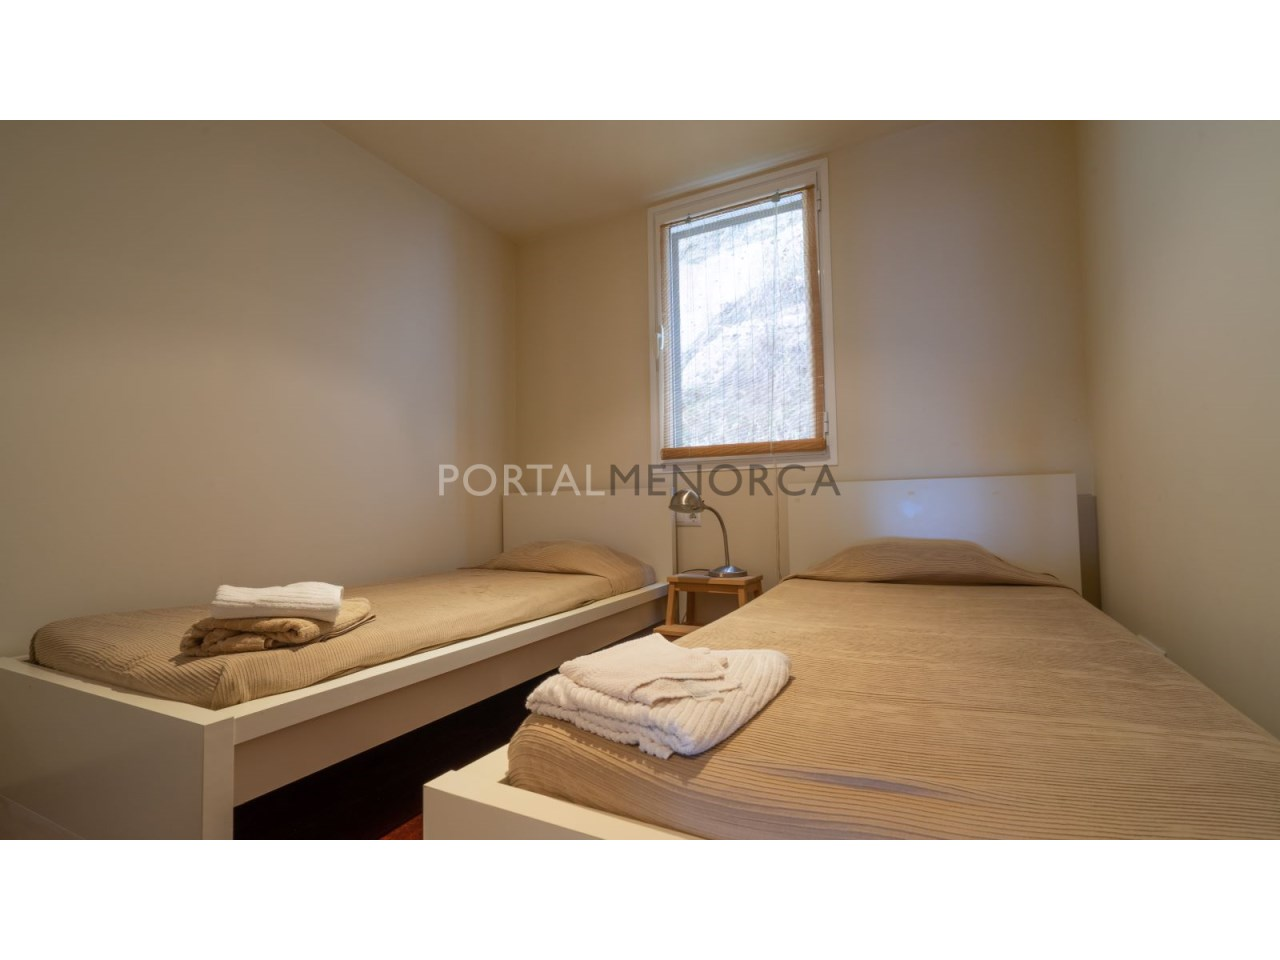 acheter-appartement-menorca (3)